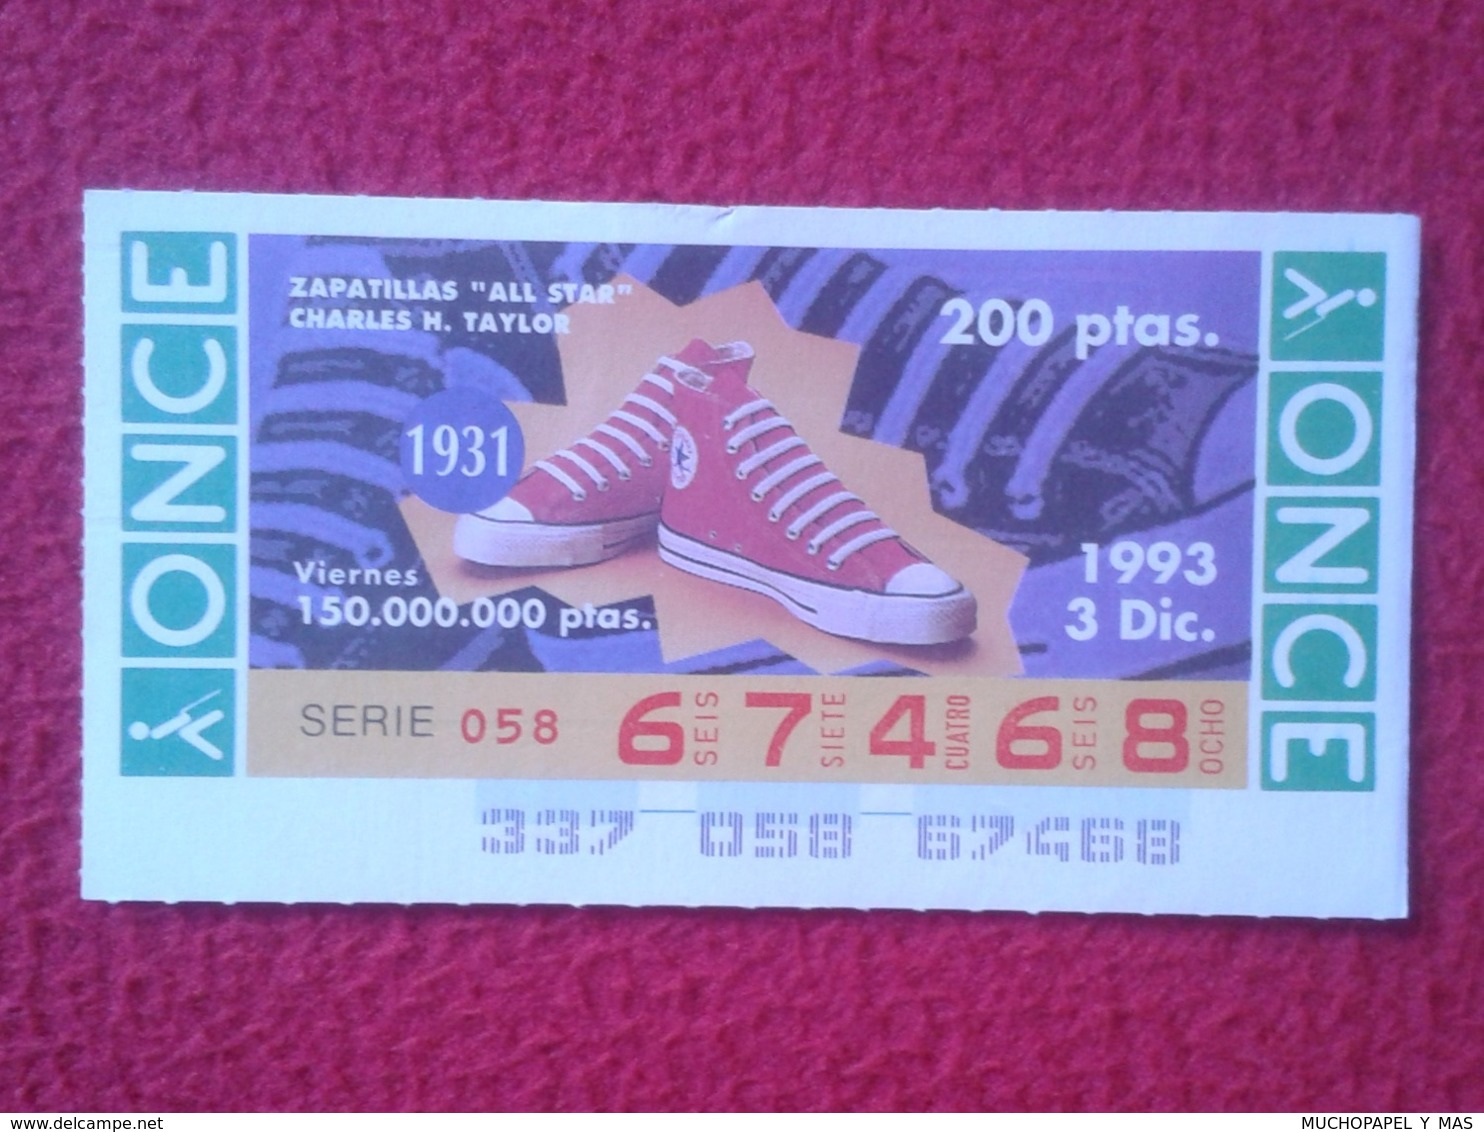 CUPÓN DE ONCE 1993 LOTTERY LOTERIE SPAIN CIEGOS BLIND LOTERÍA ZAPATILLAS ALL STAR CHARLES H. TAYLOR 1931 SNEAKERS SHOES - Billetes De Lotería